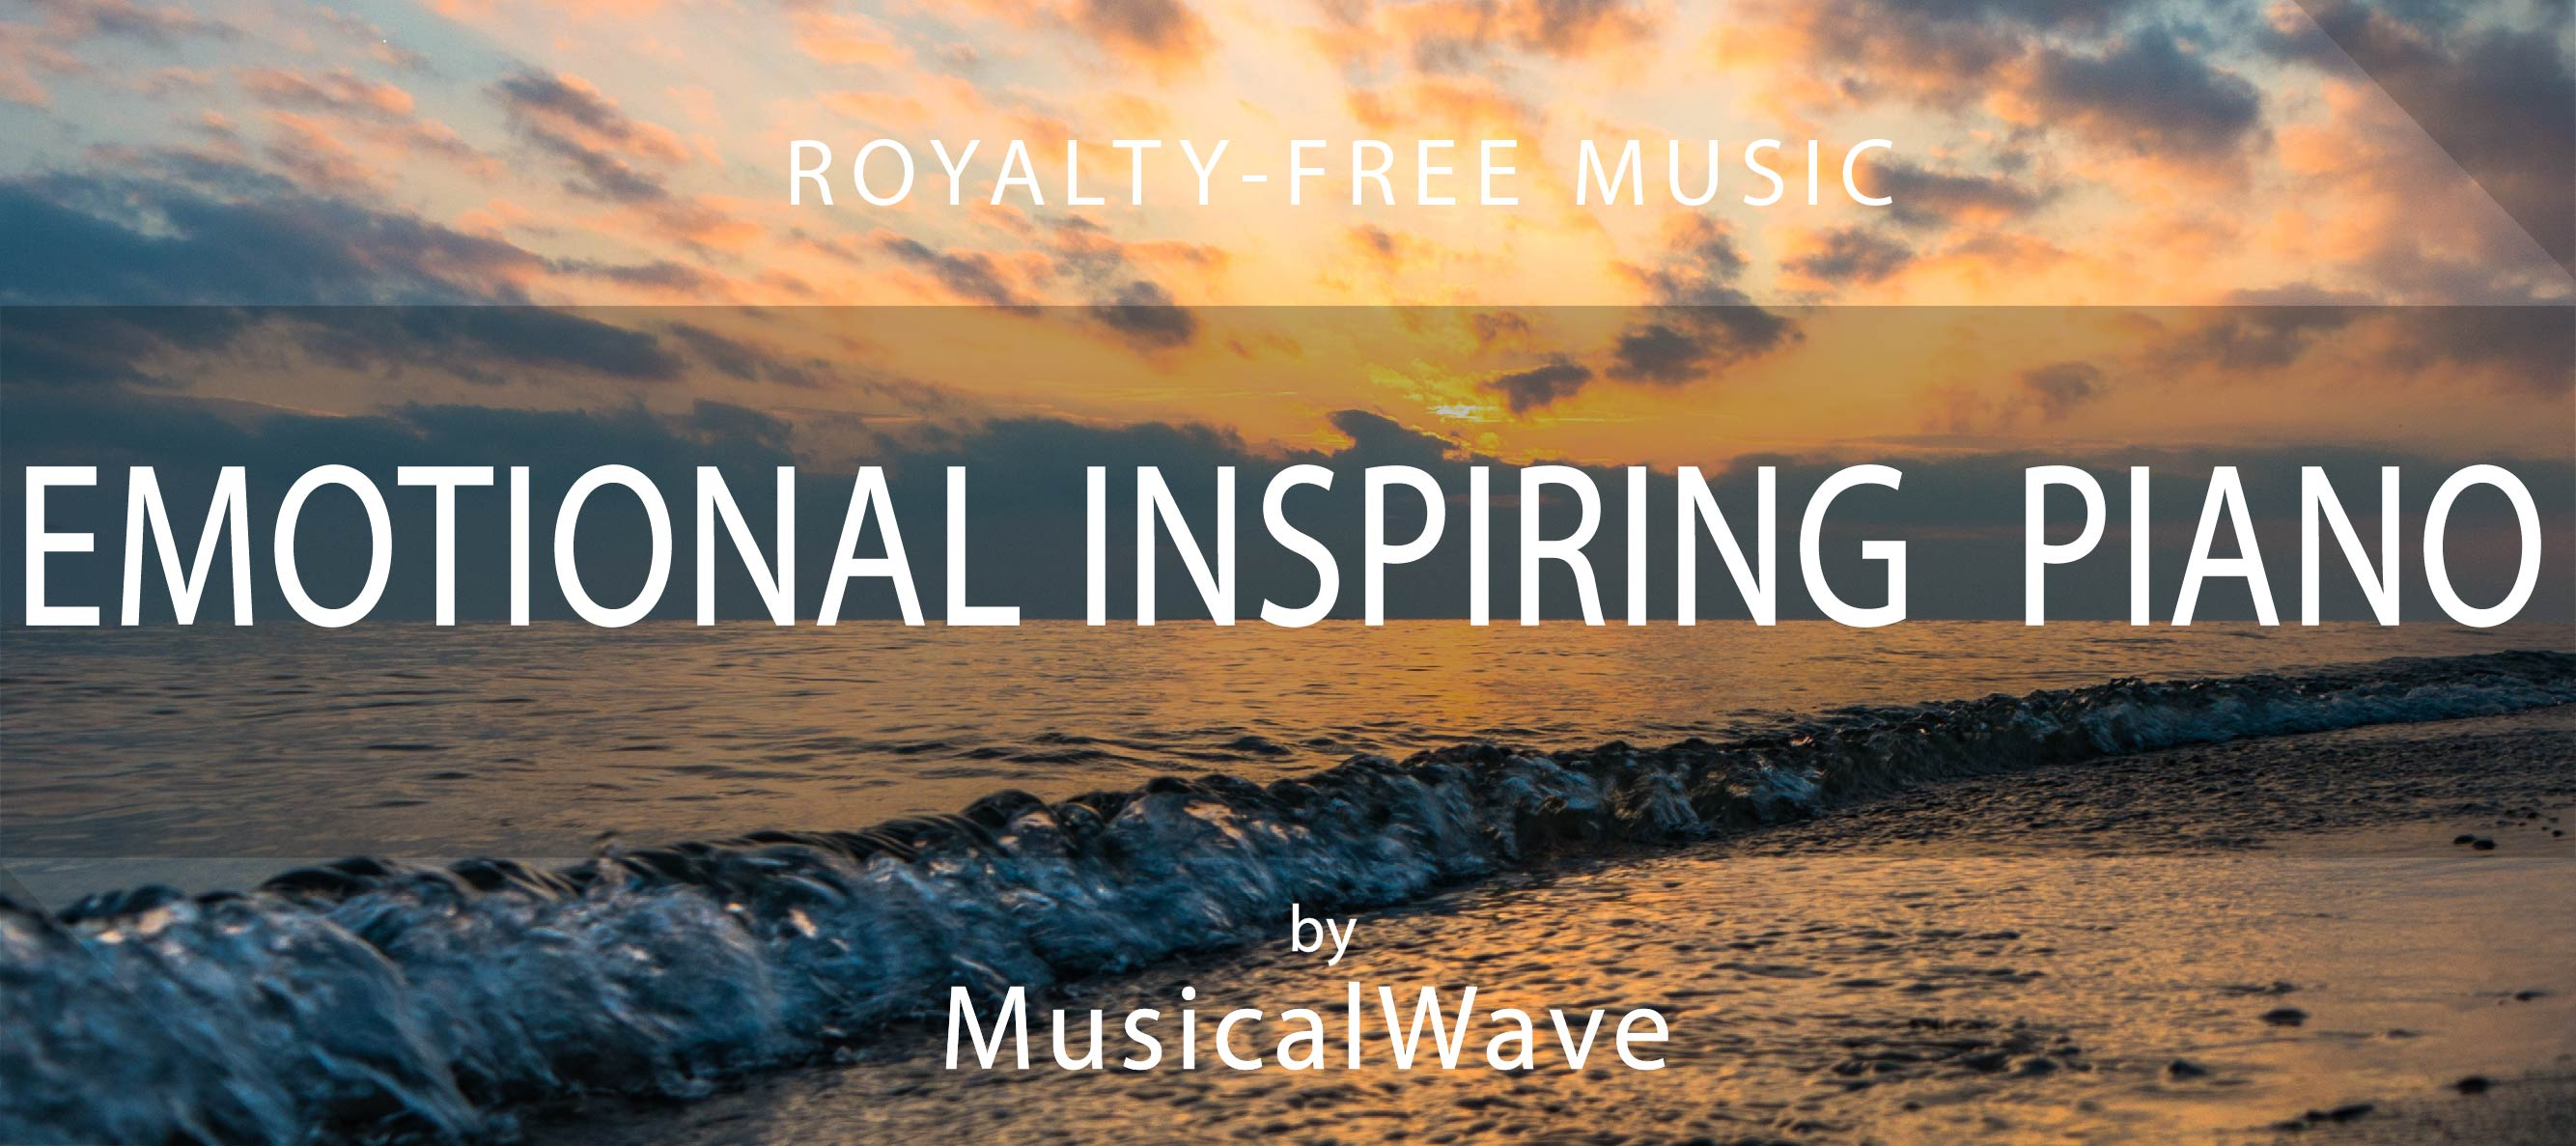 Emotional Inspiring Piano by MusicalWave | AudioJungle